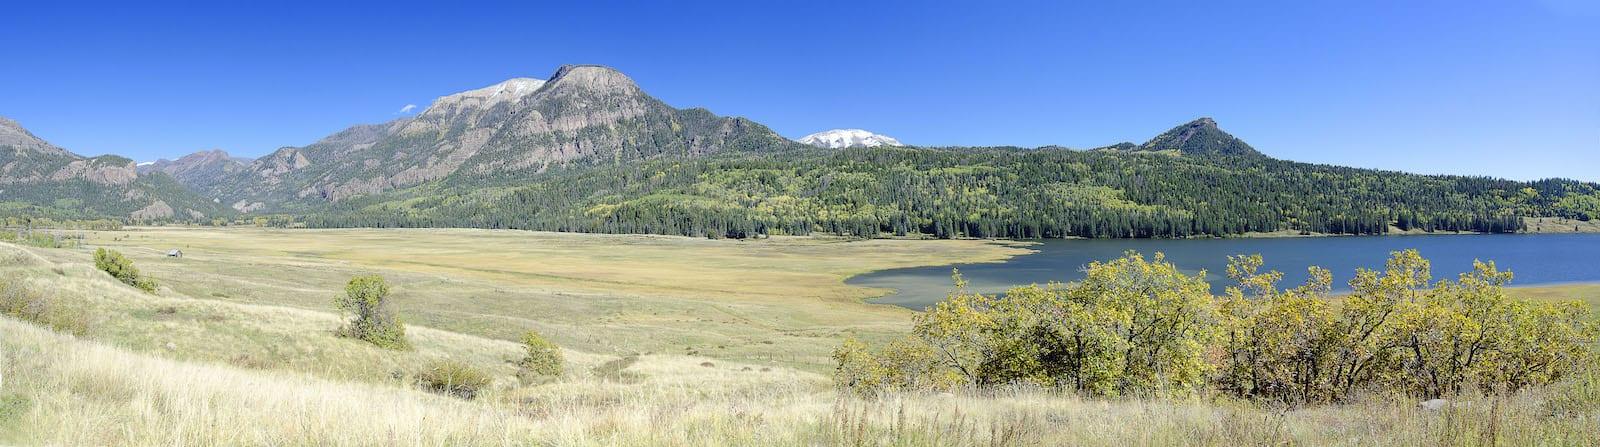 Williams Creek Reservoir Panorama, CO